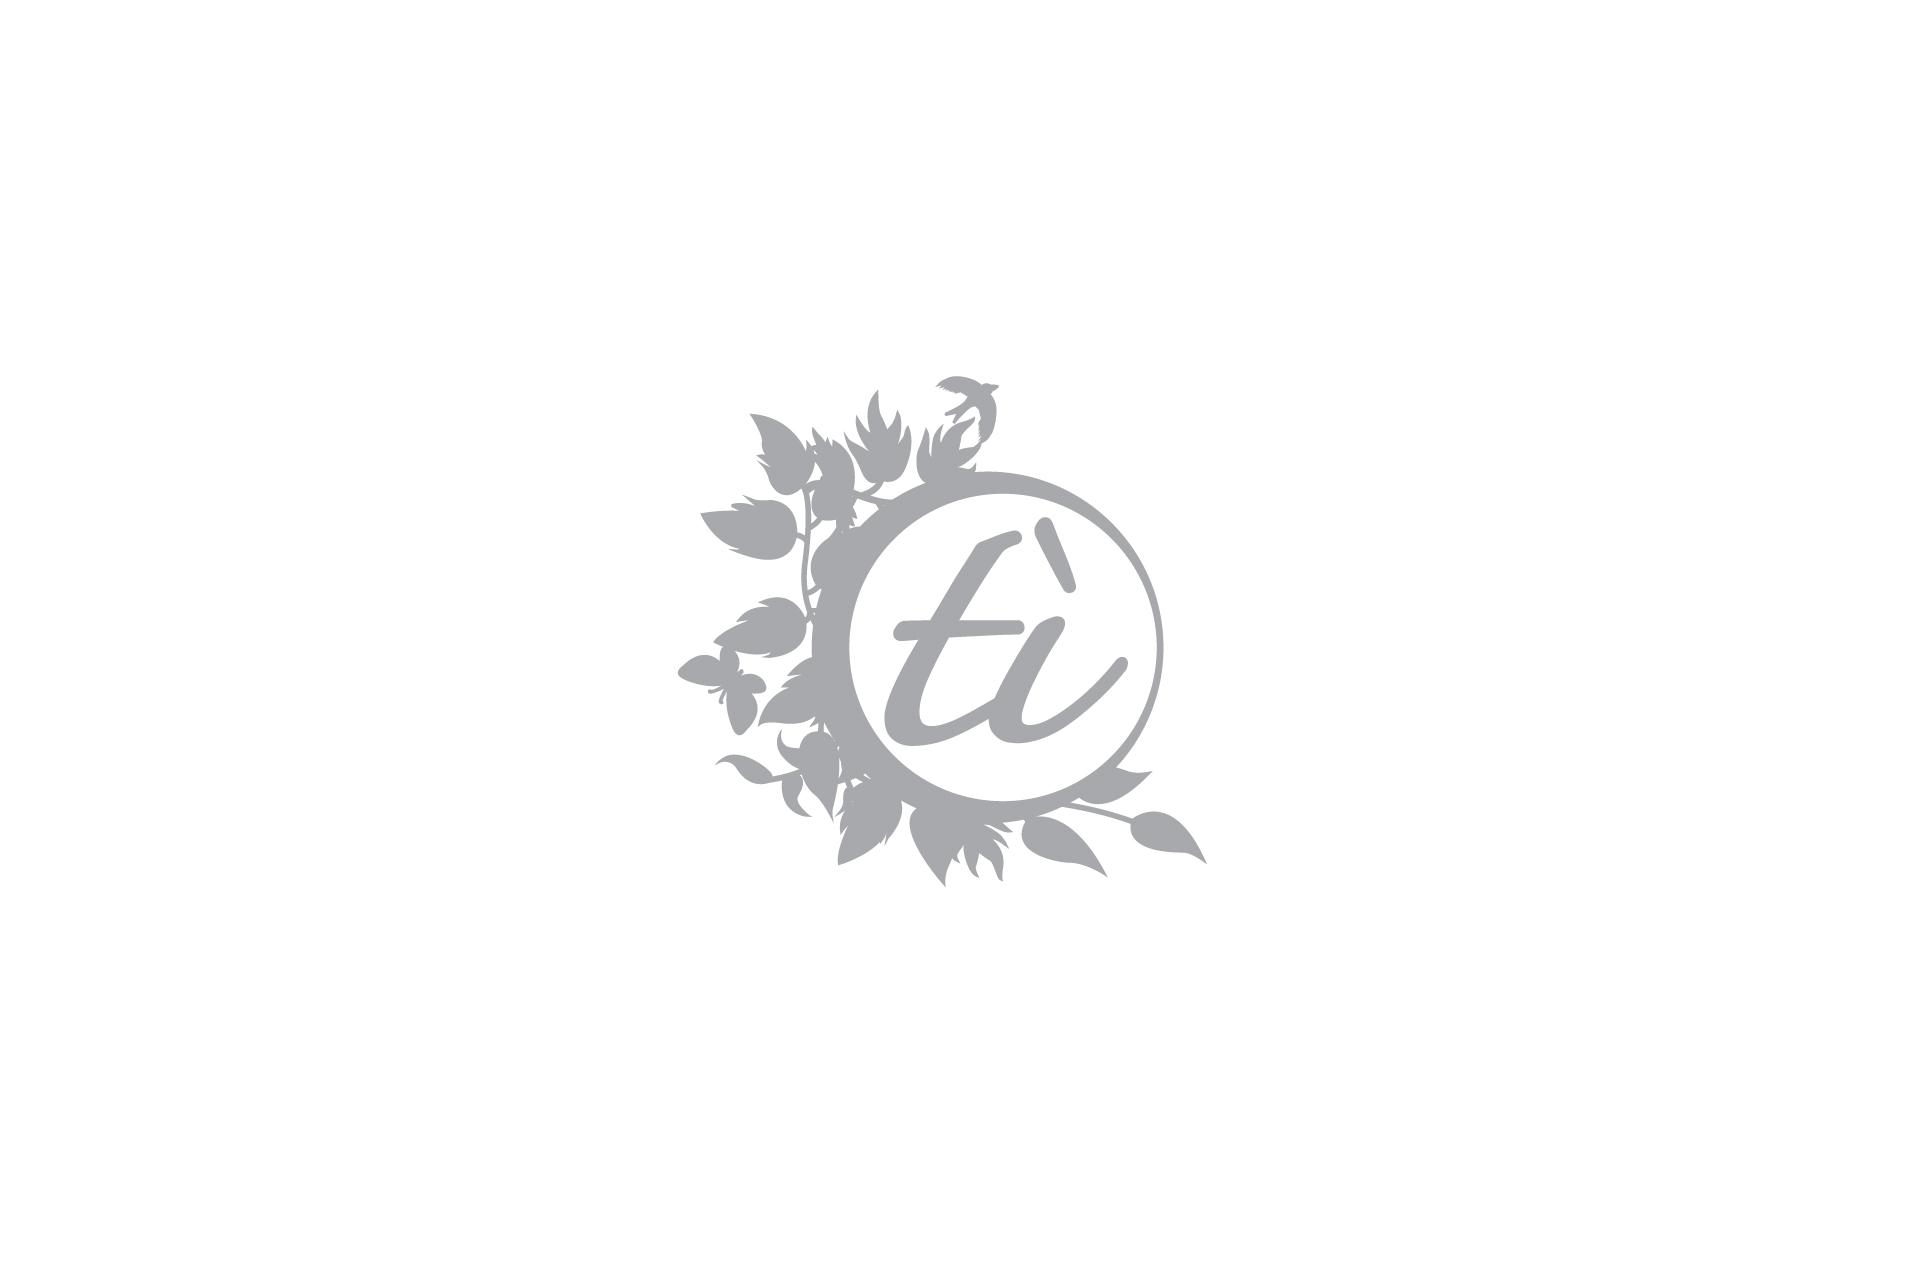 Showcase Logos-09.jpg